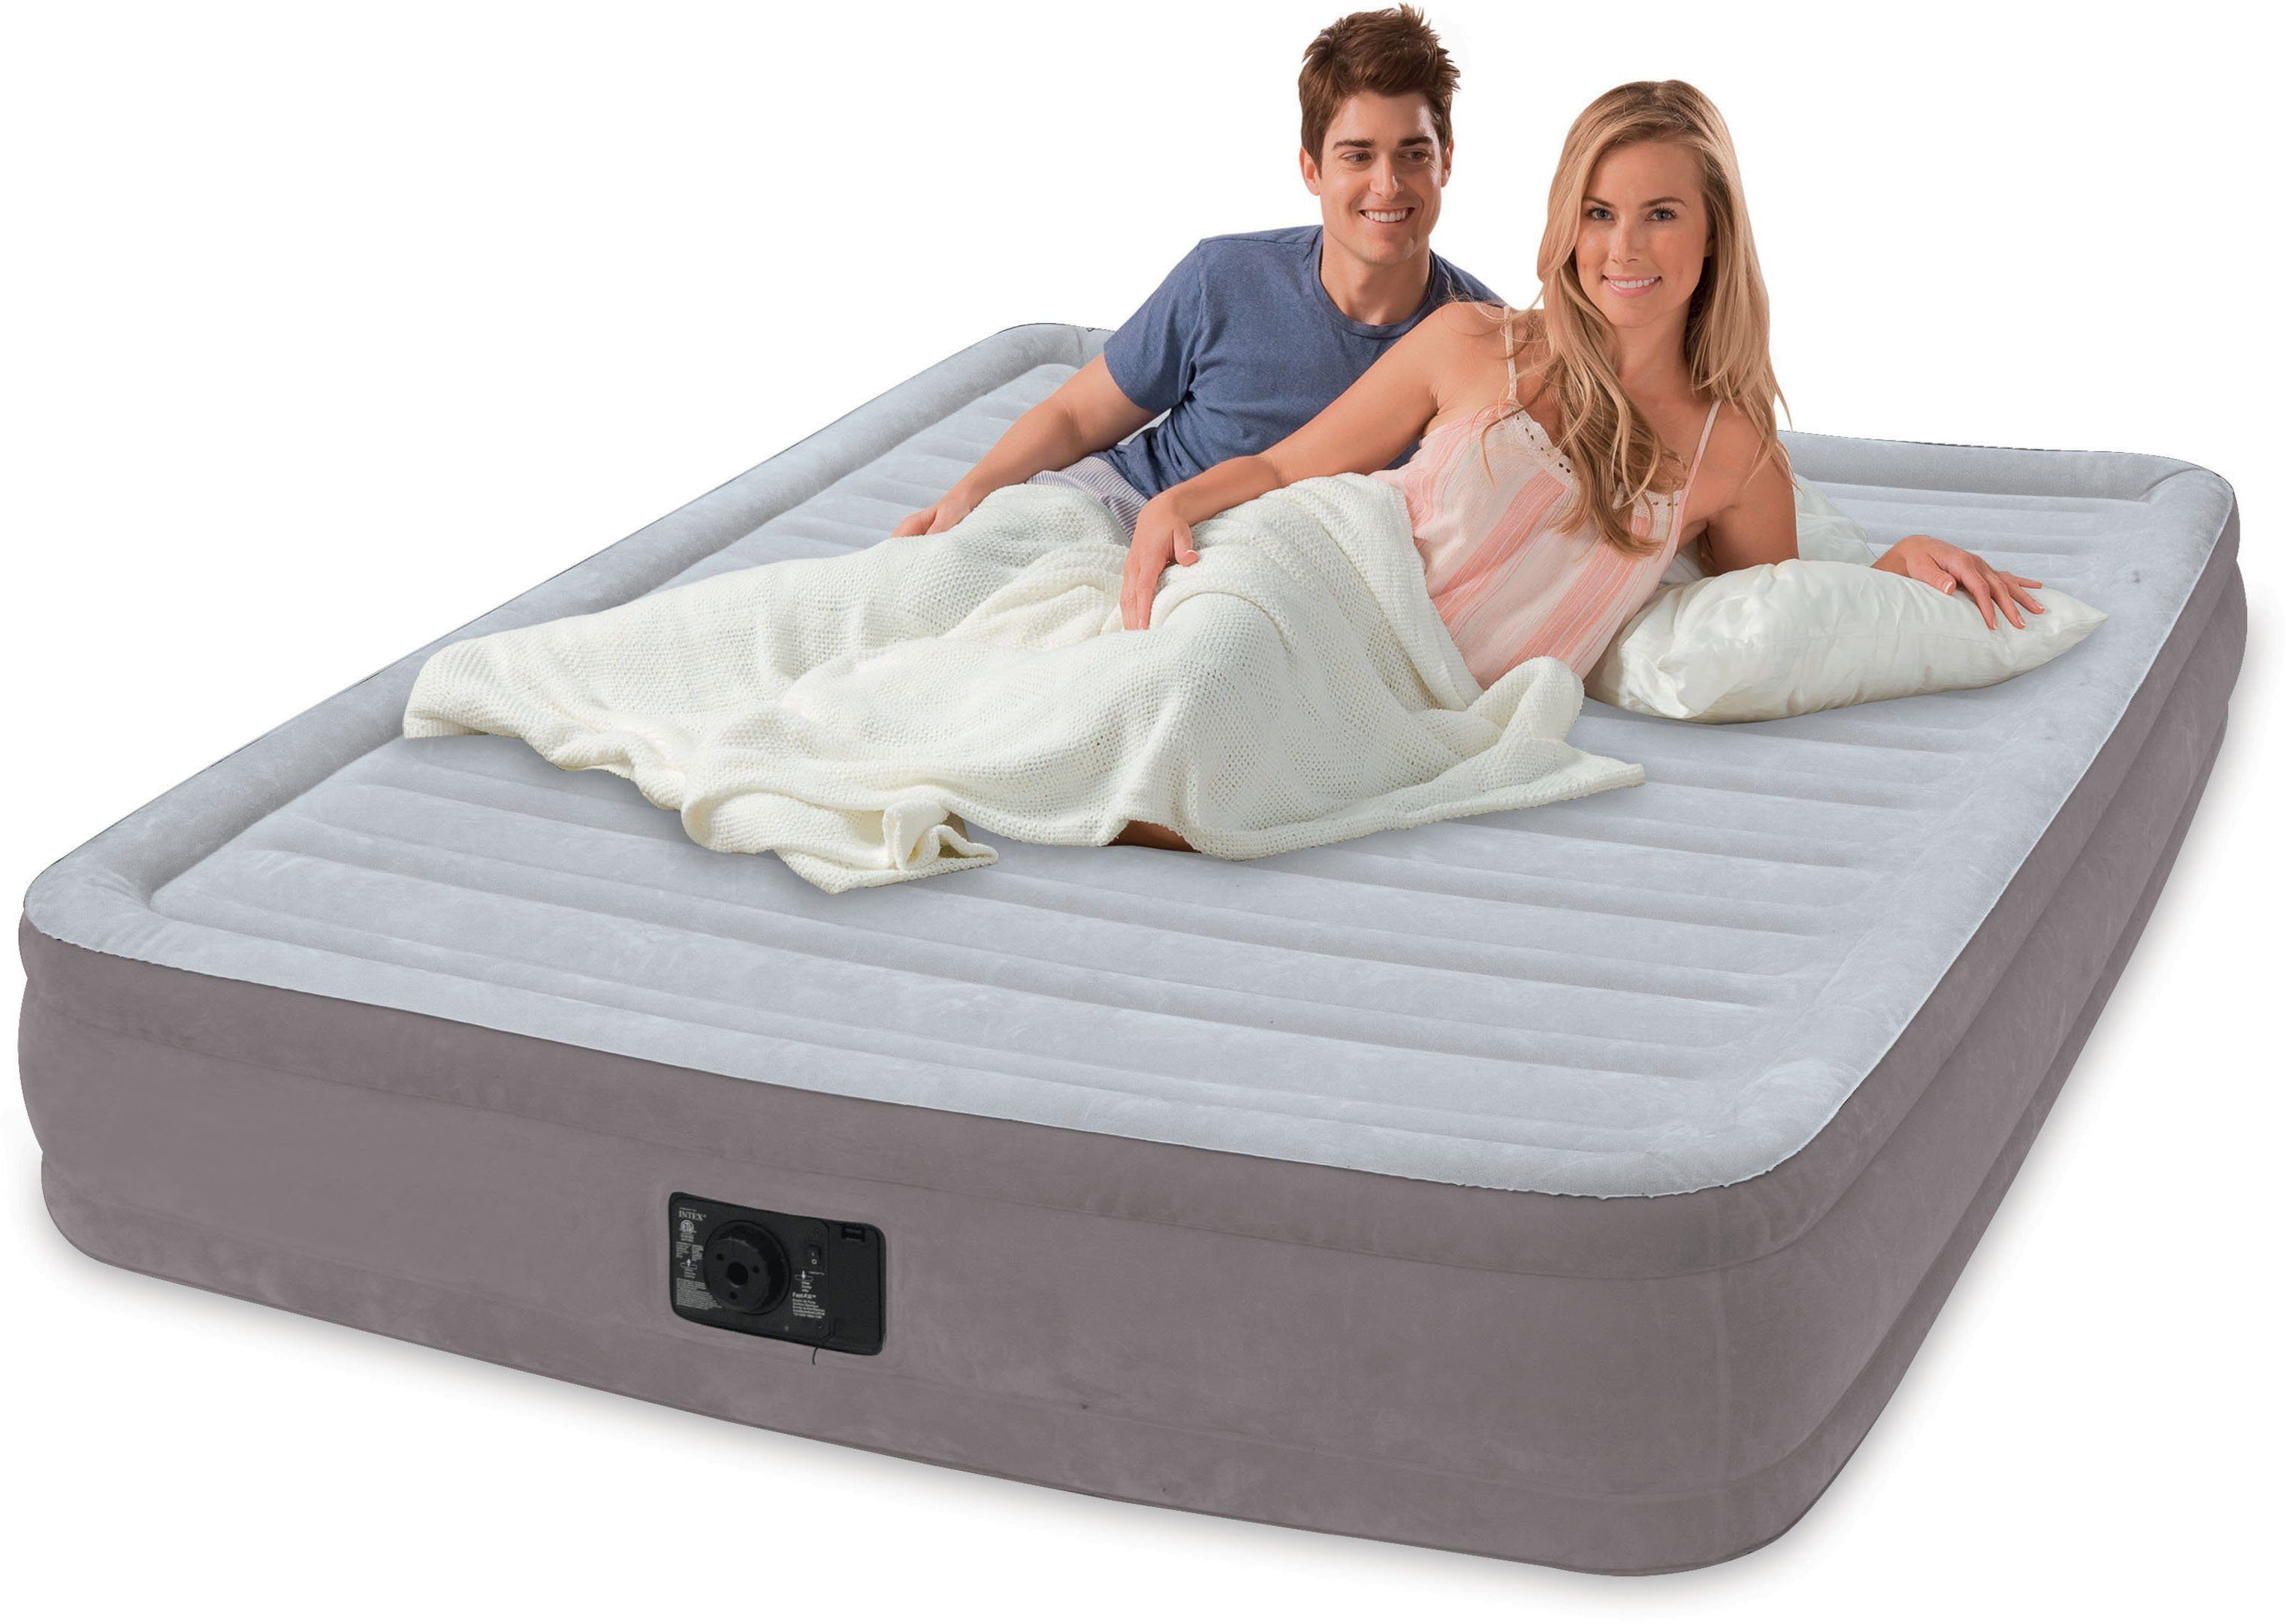 Intex Luftbett mit integrierter Elektropumpe, »Comfort-Plush Twin«